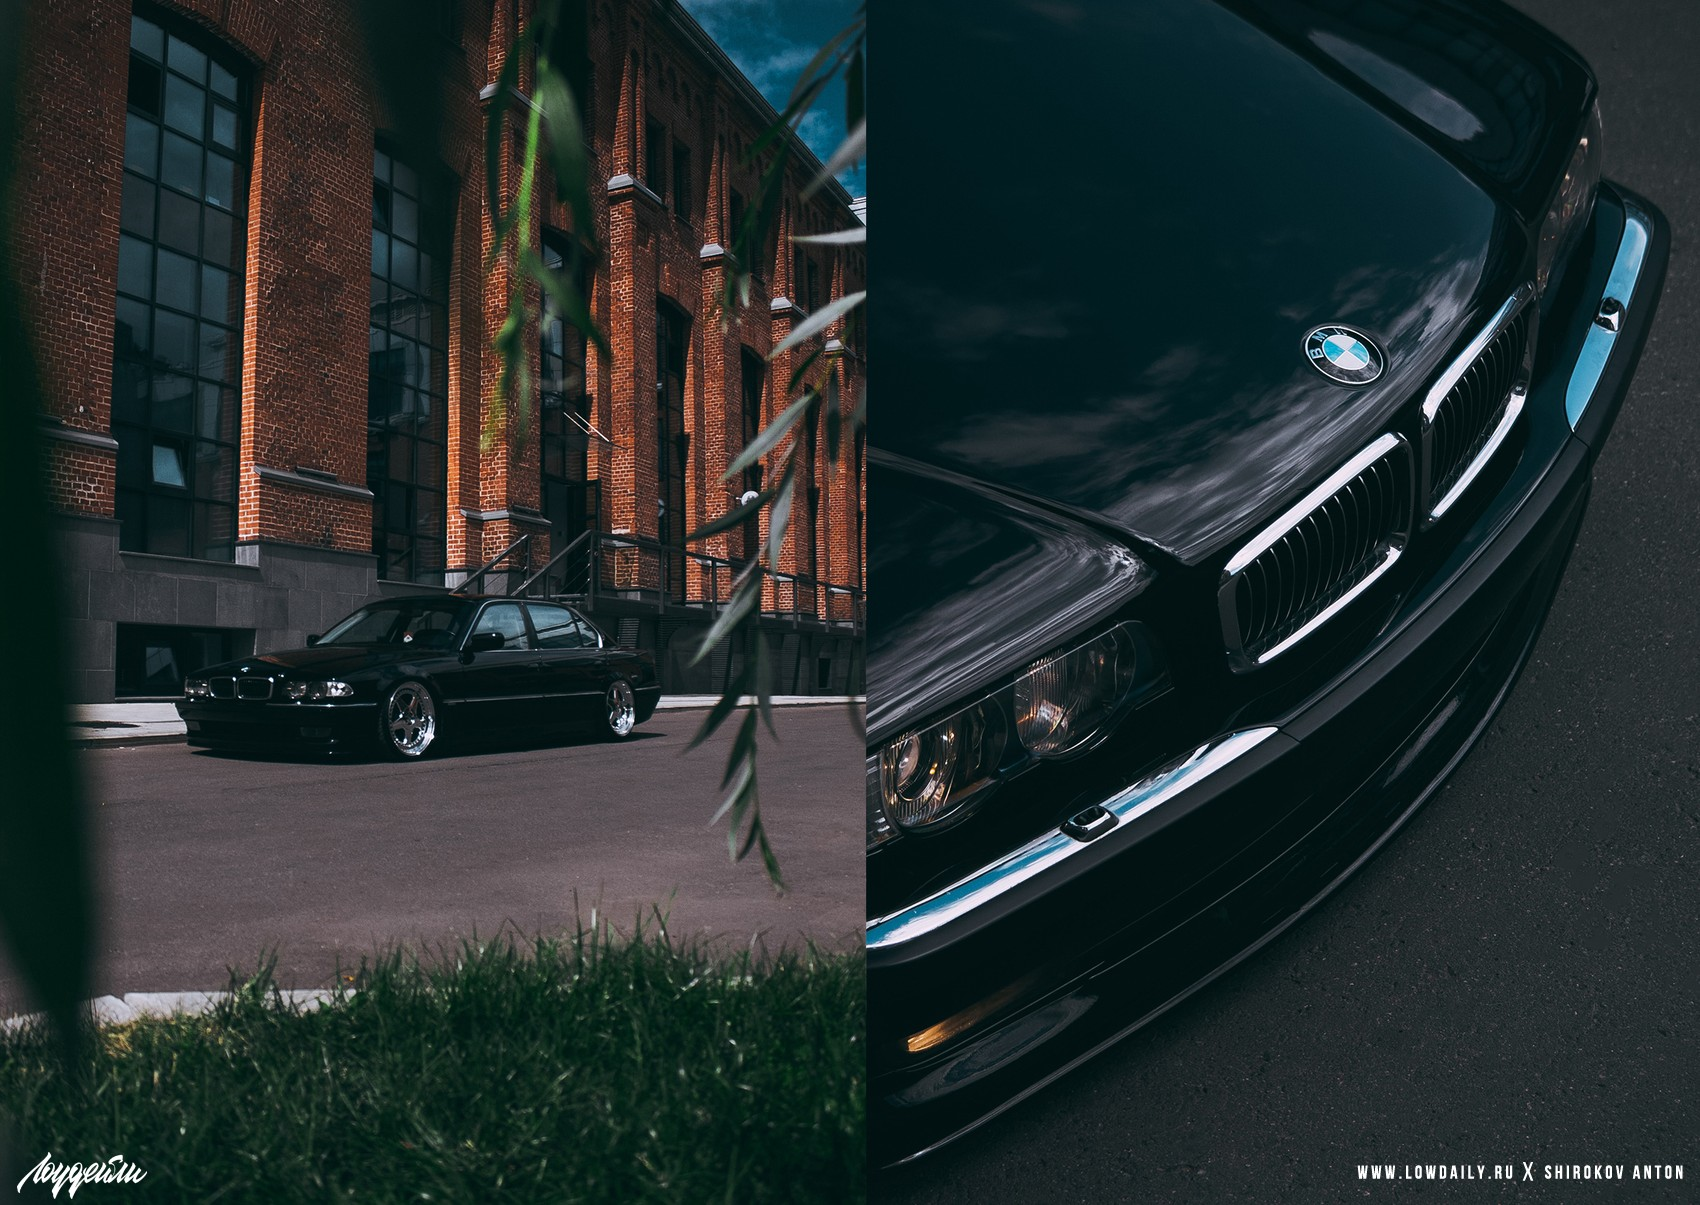 BMW E38 Lowdaily _MG_7096_12